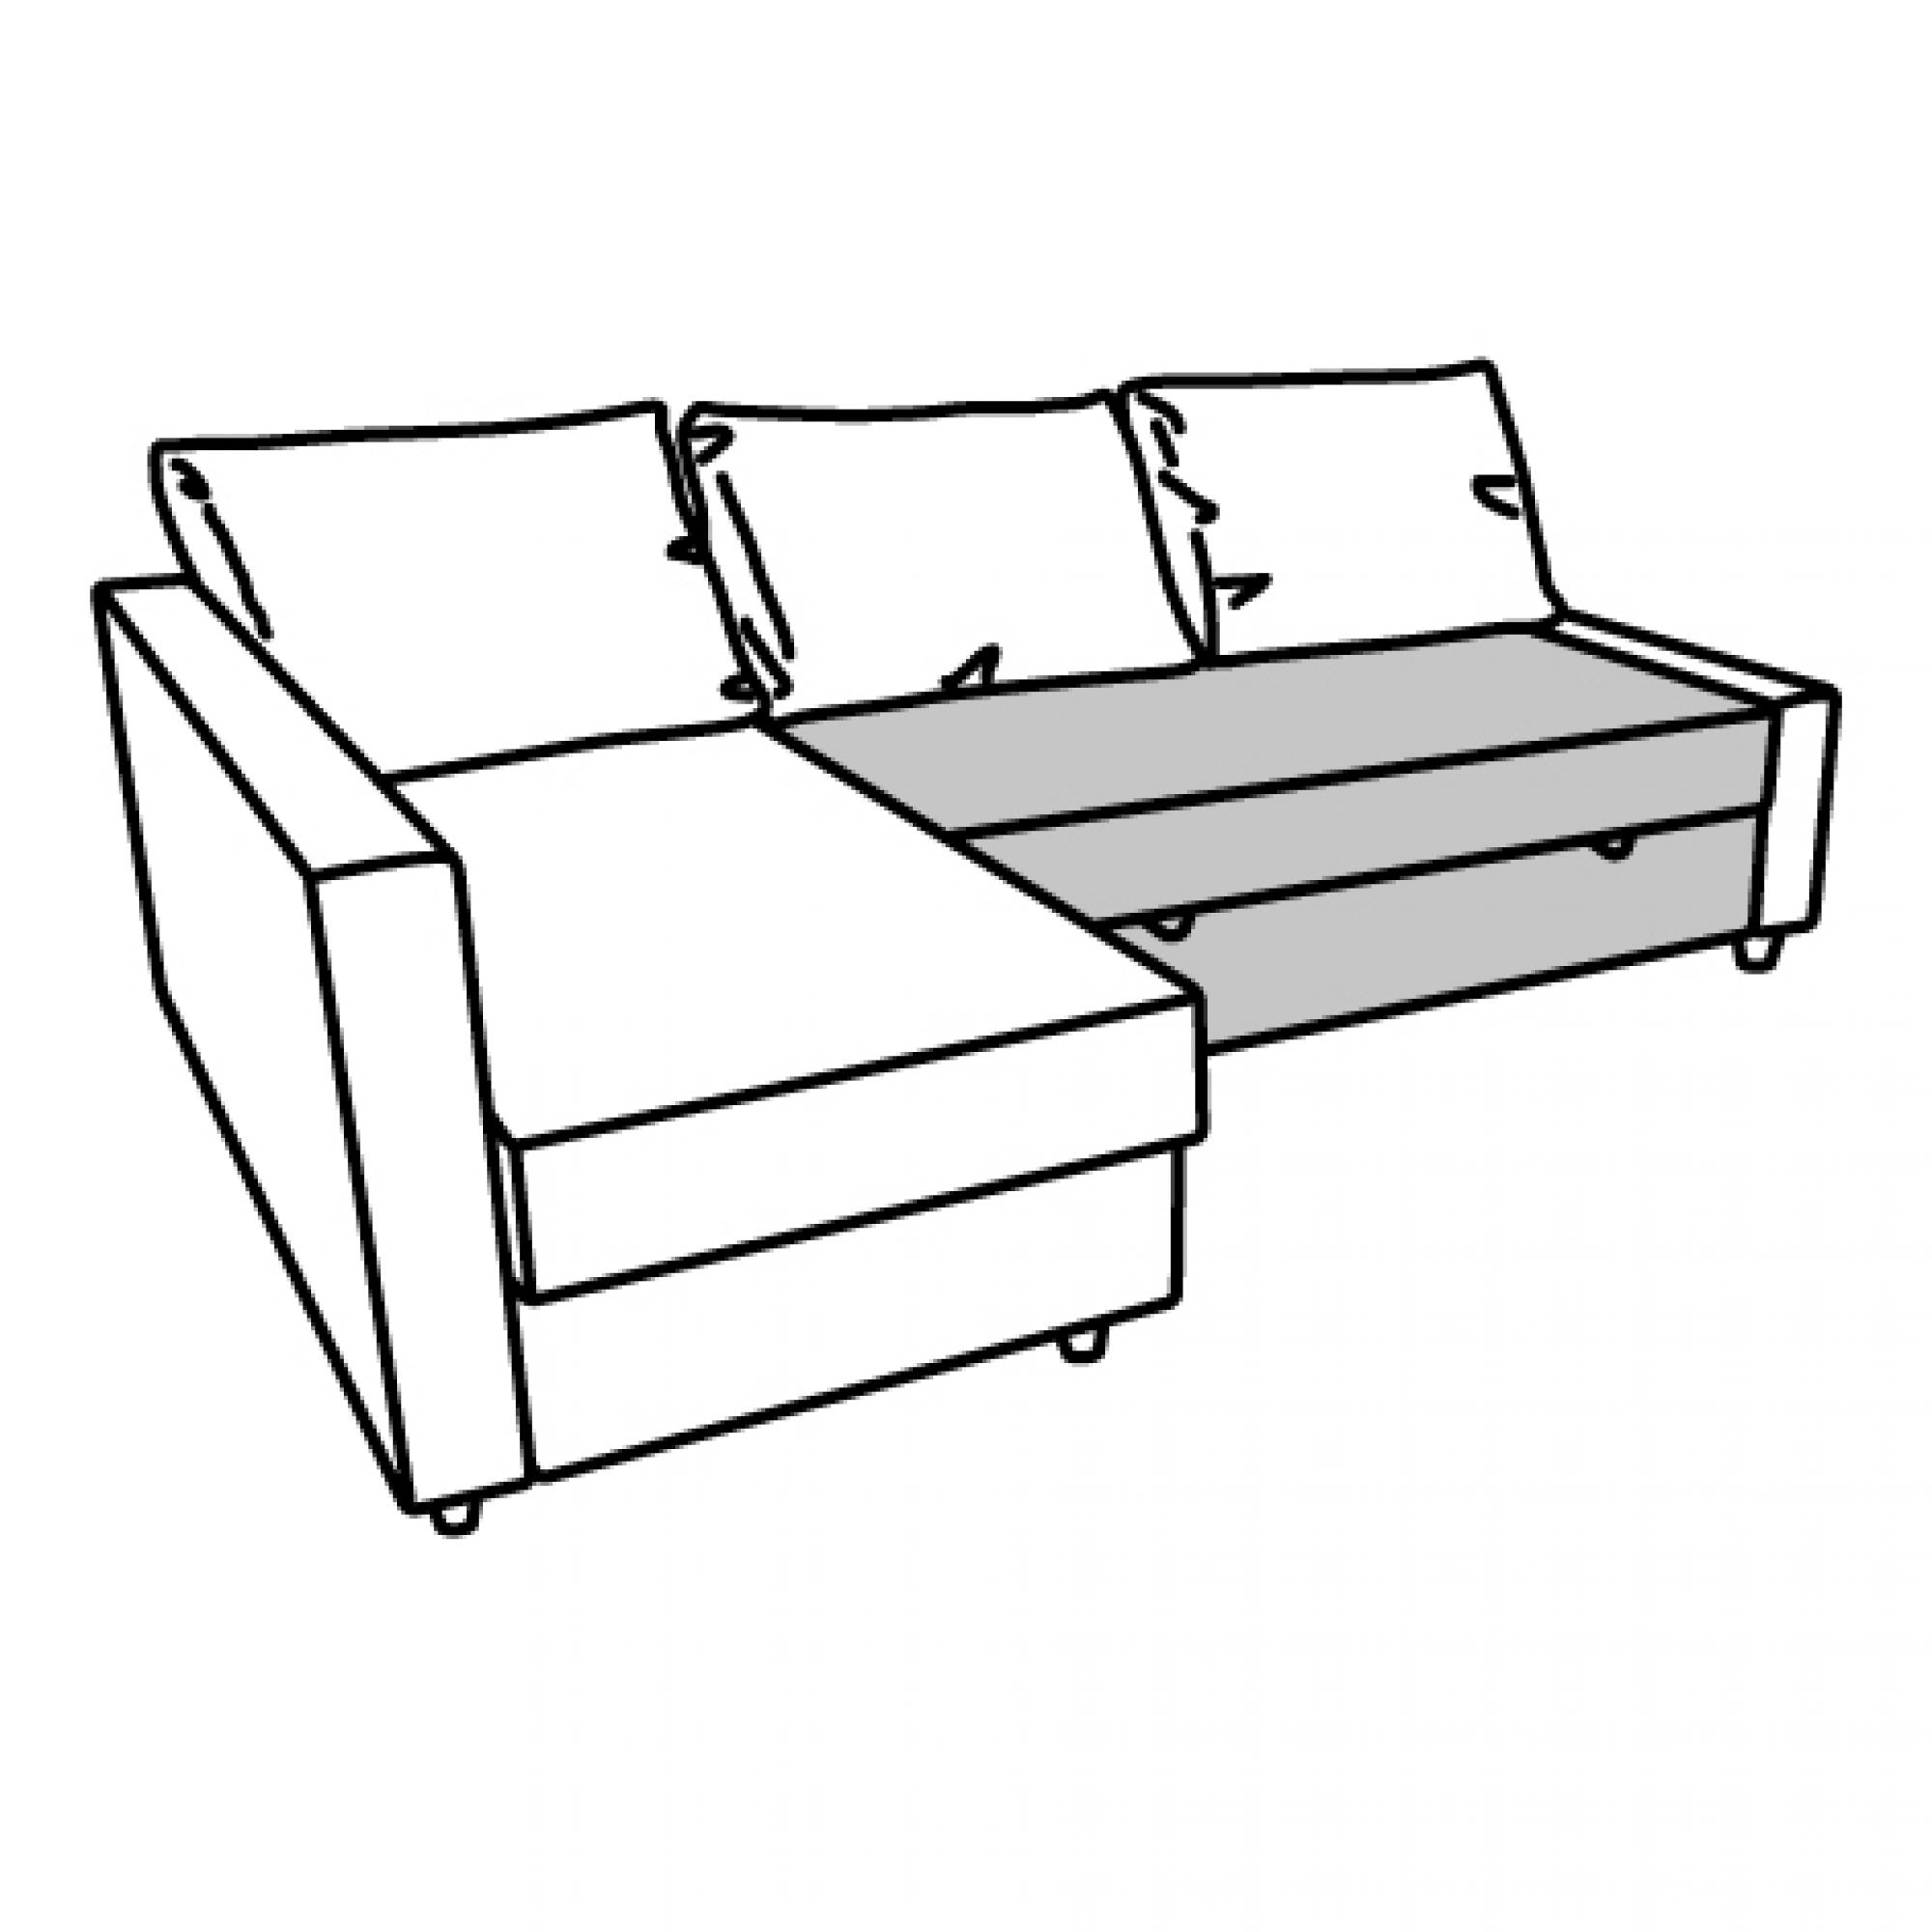 friheten seat section for corner sofa bed orange Ikea Home Planner Change To Metric Ikea Home Planner Change To Metric #4 ikea home planner change to metric